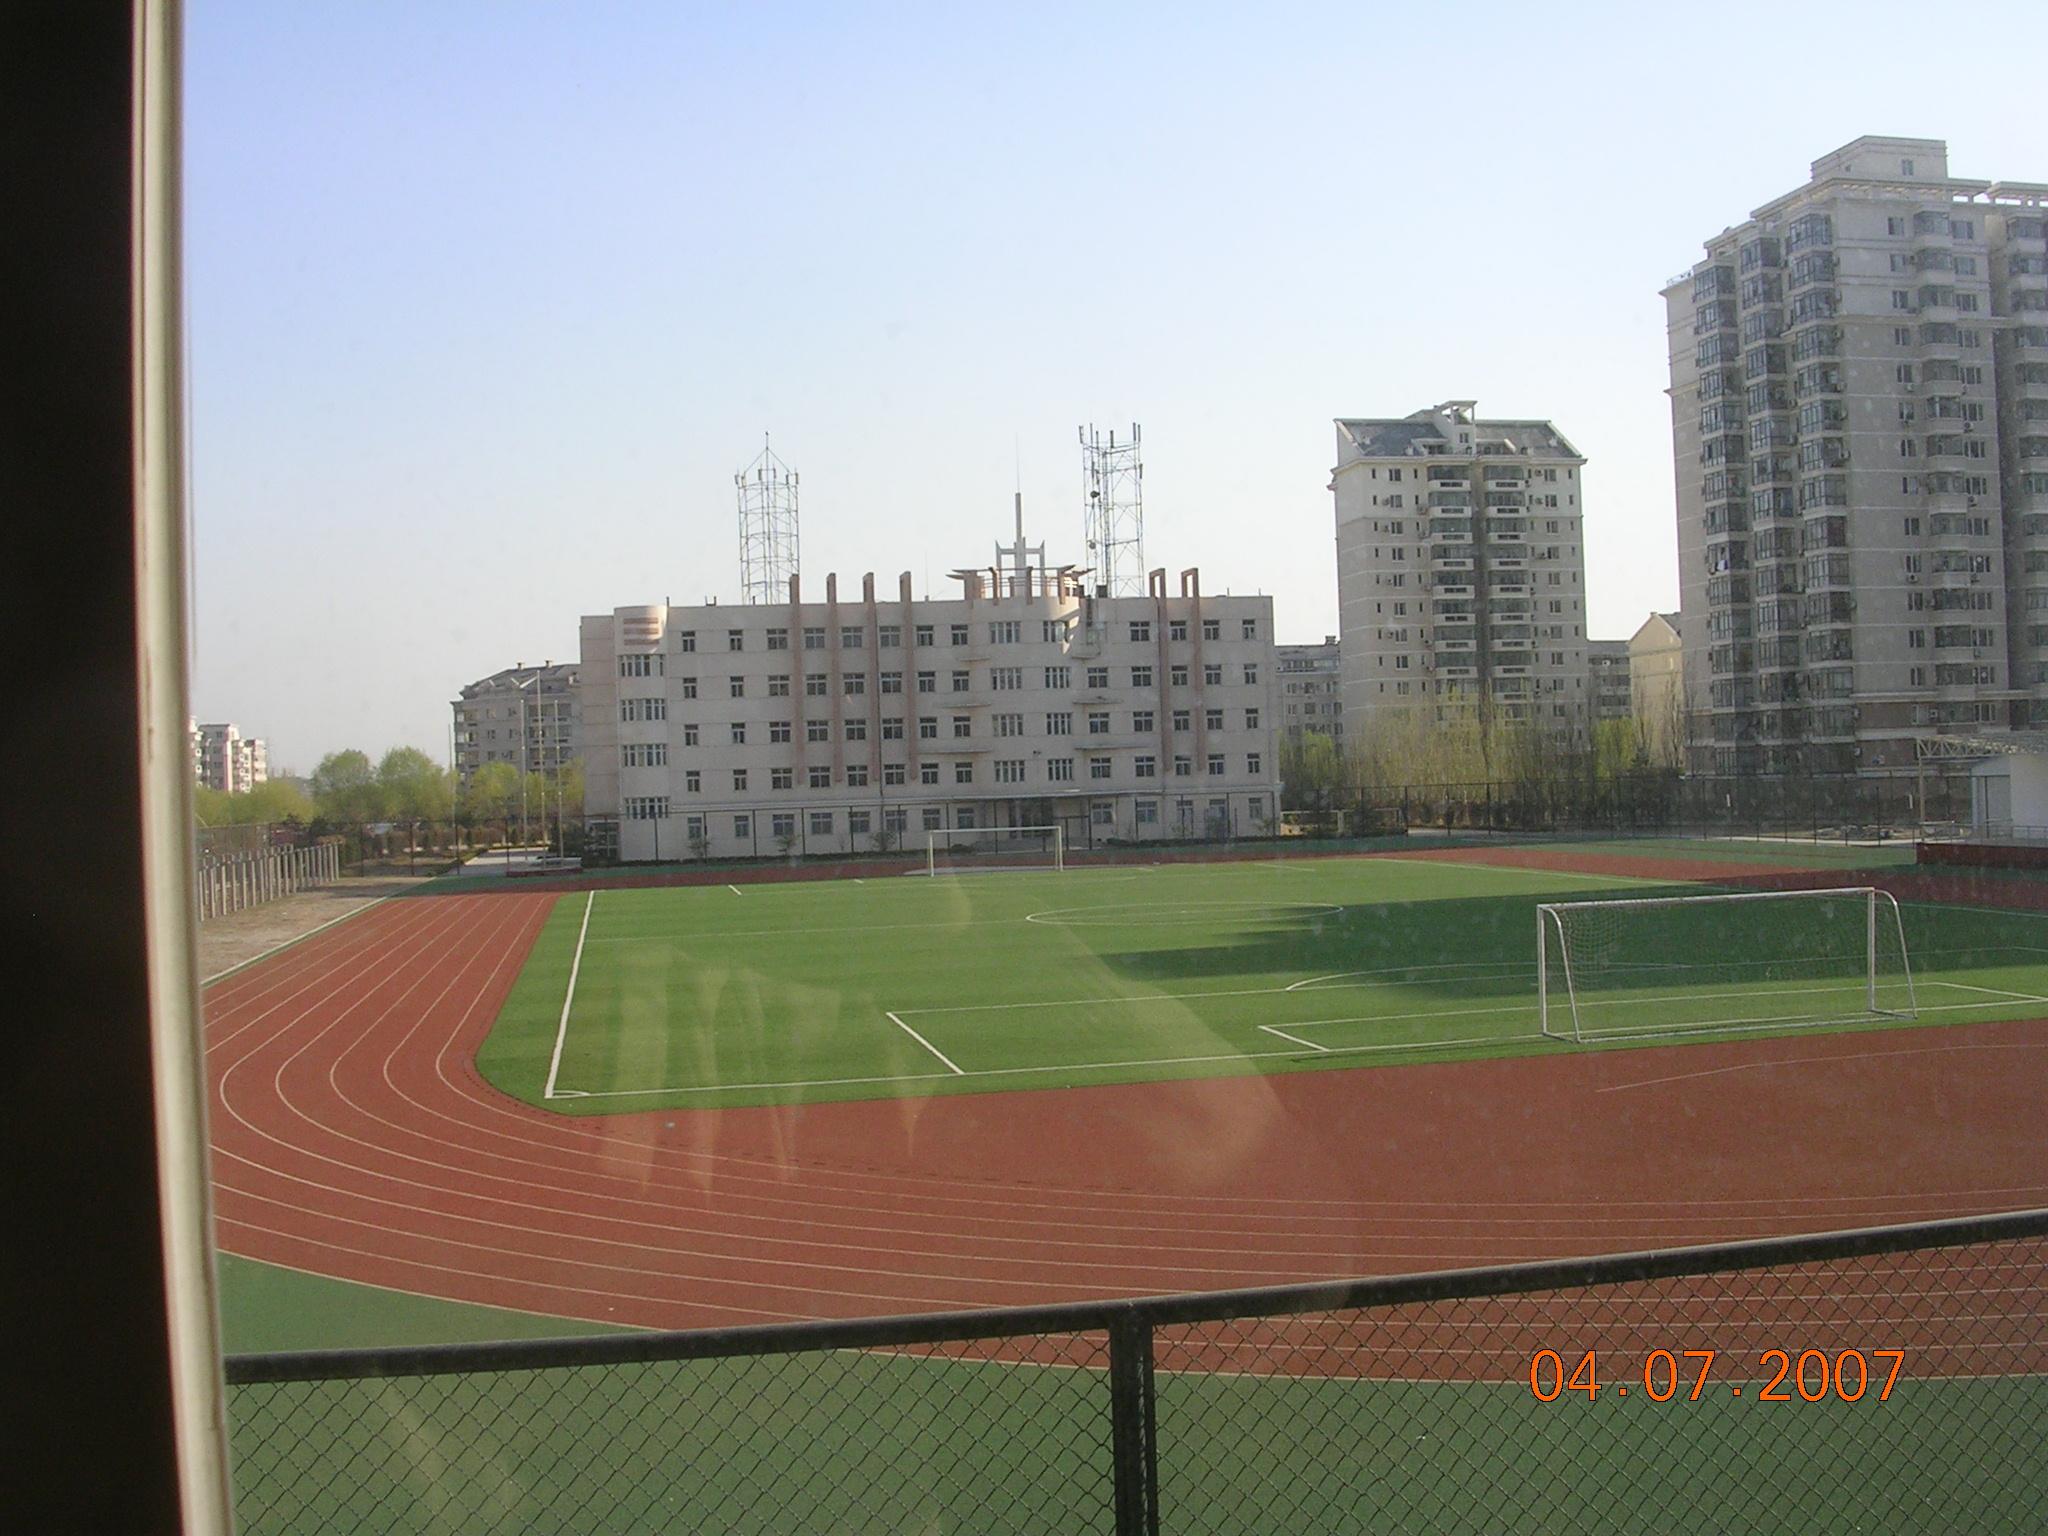 2007-04-09A 002.jpg